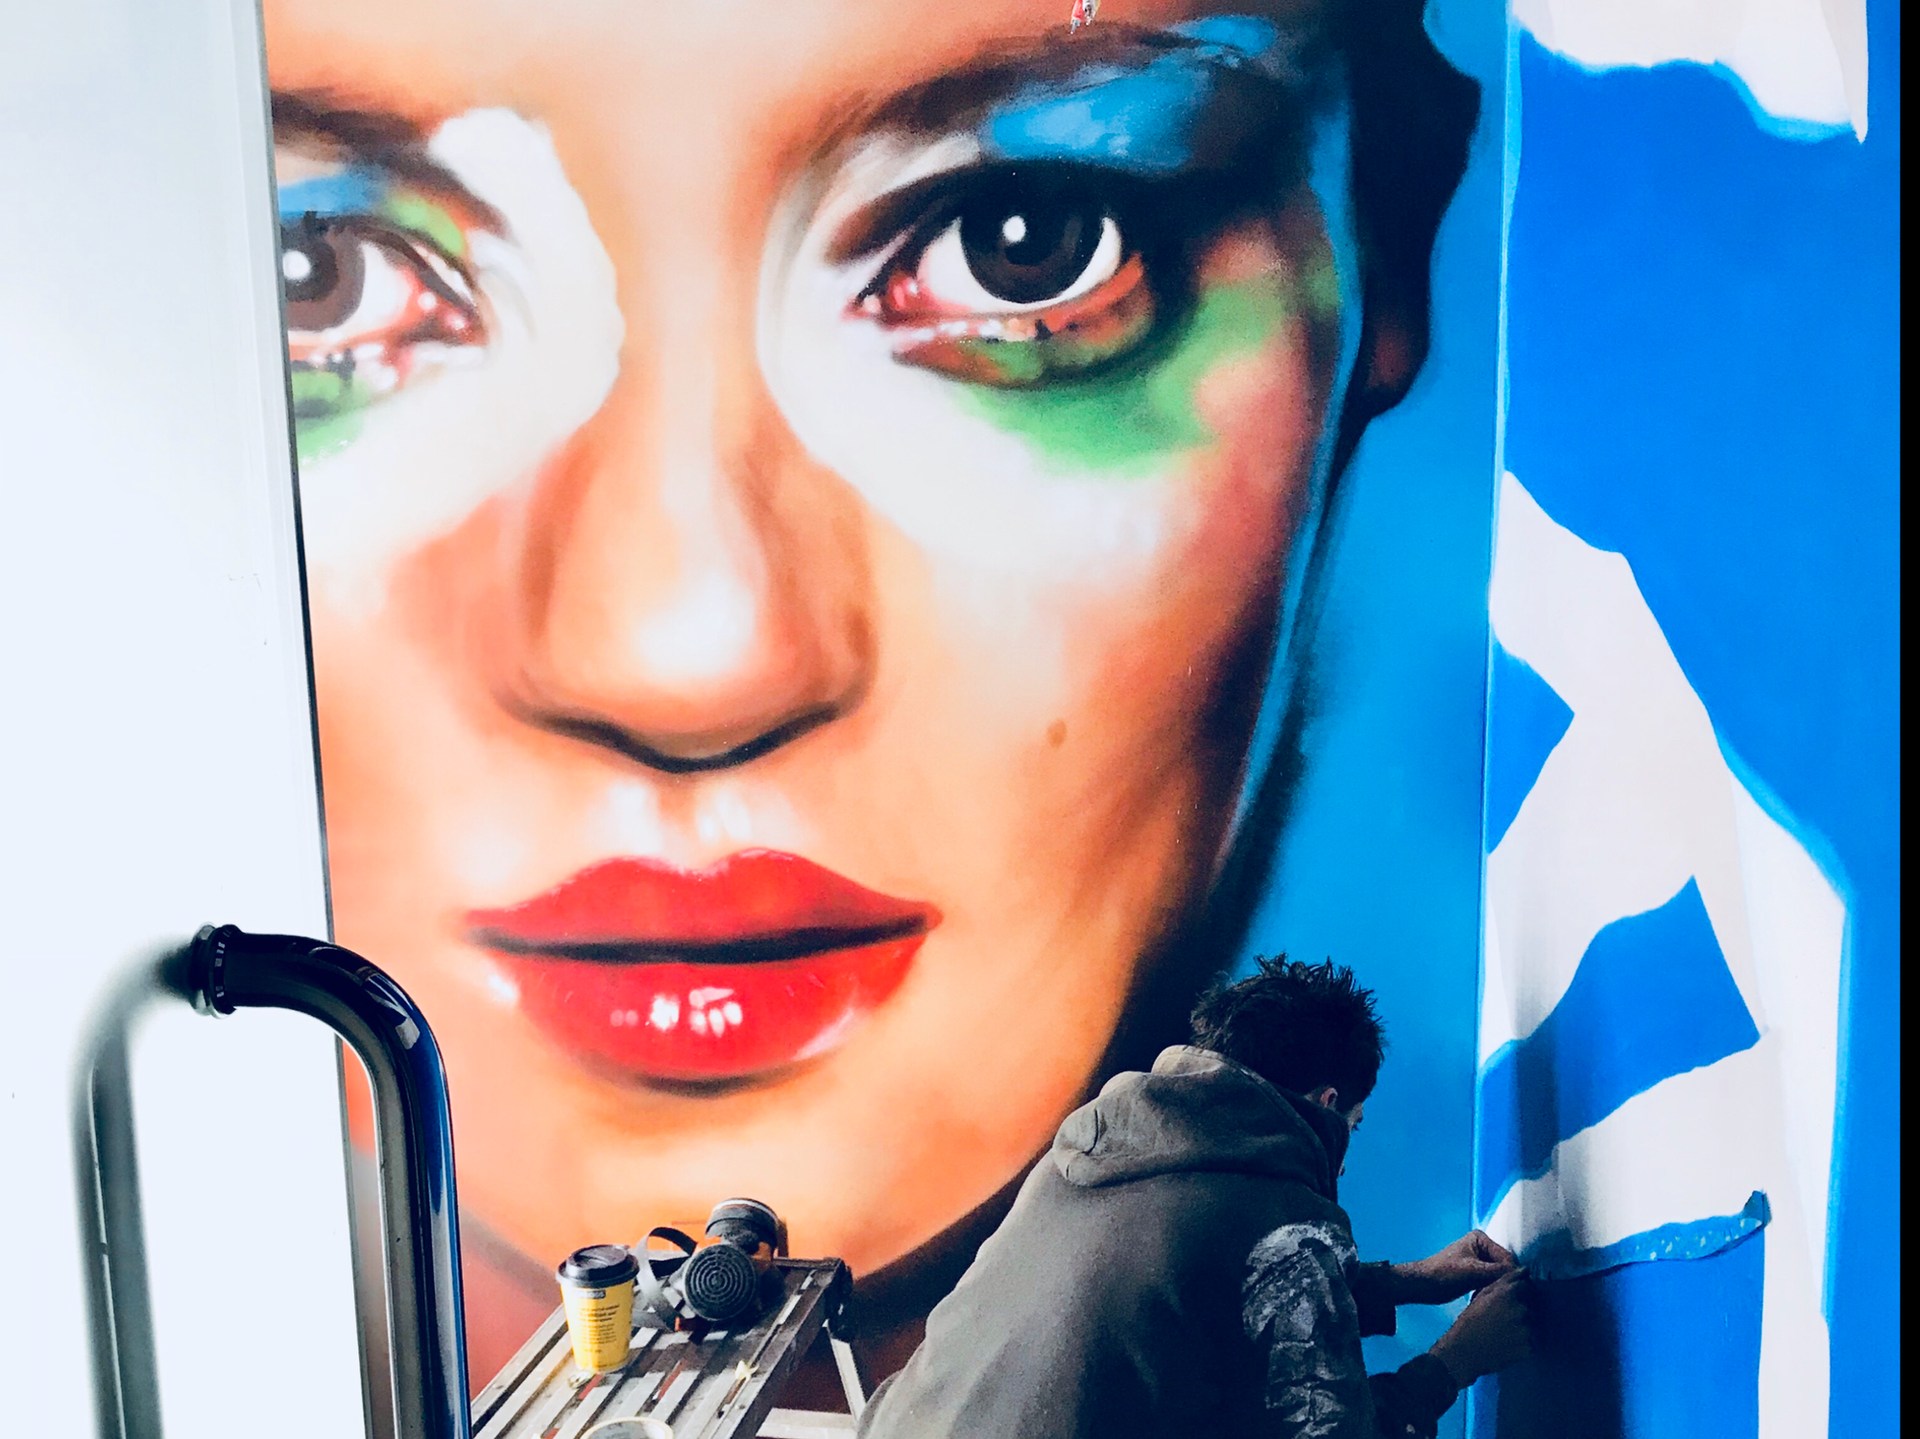 spray painted mural portrait